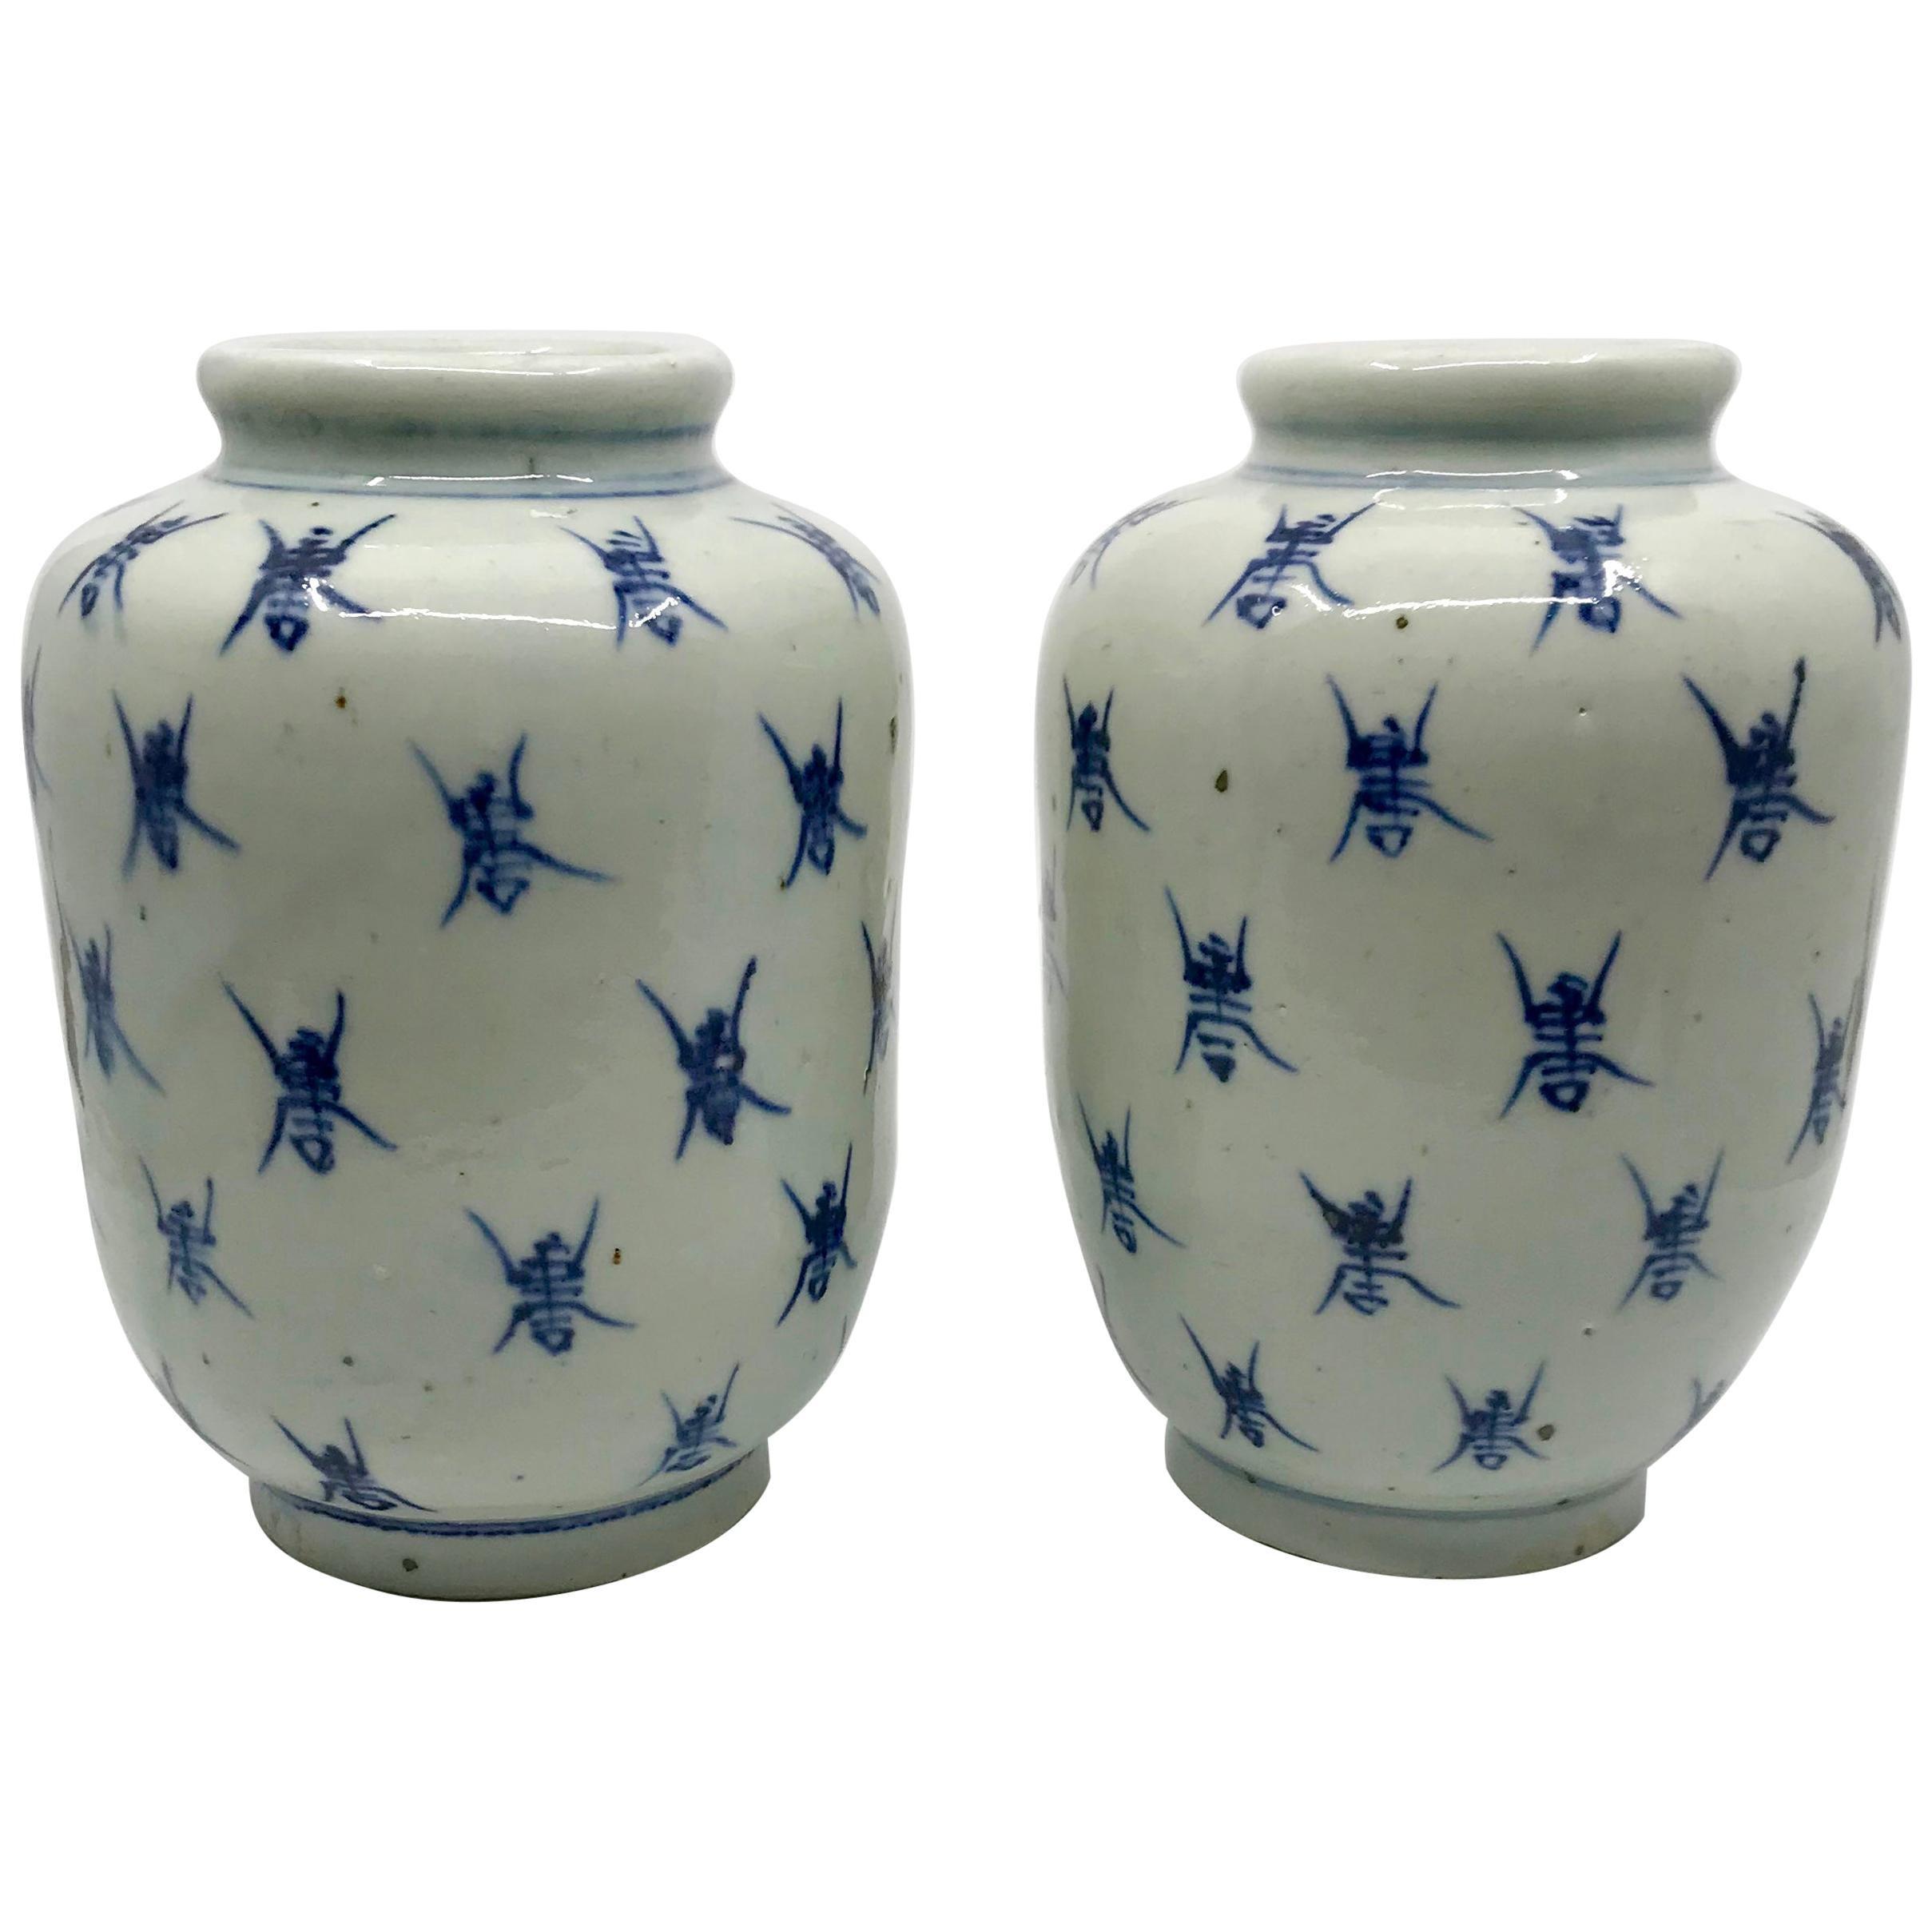 Pair of Blue and White Ginger Jar Vases